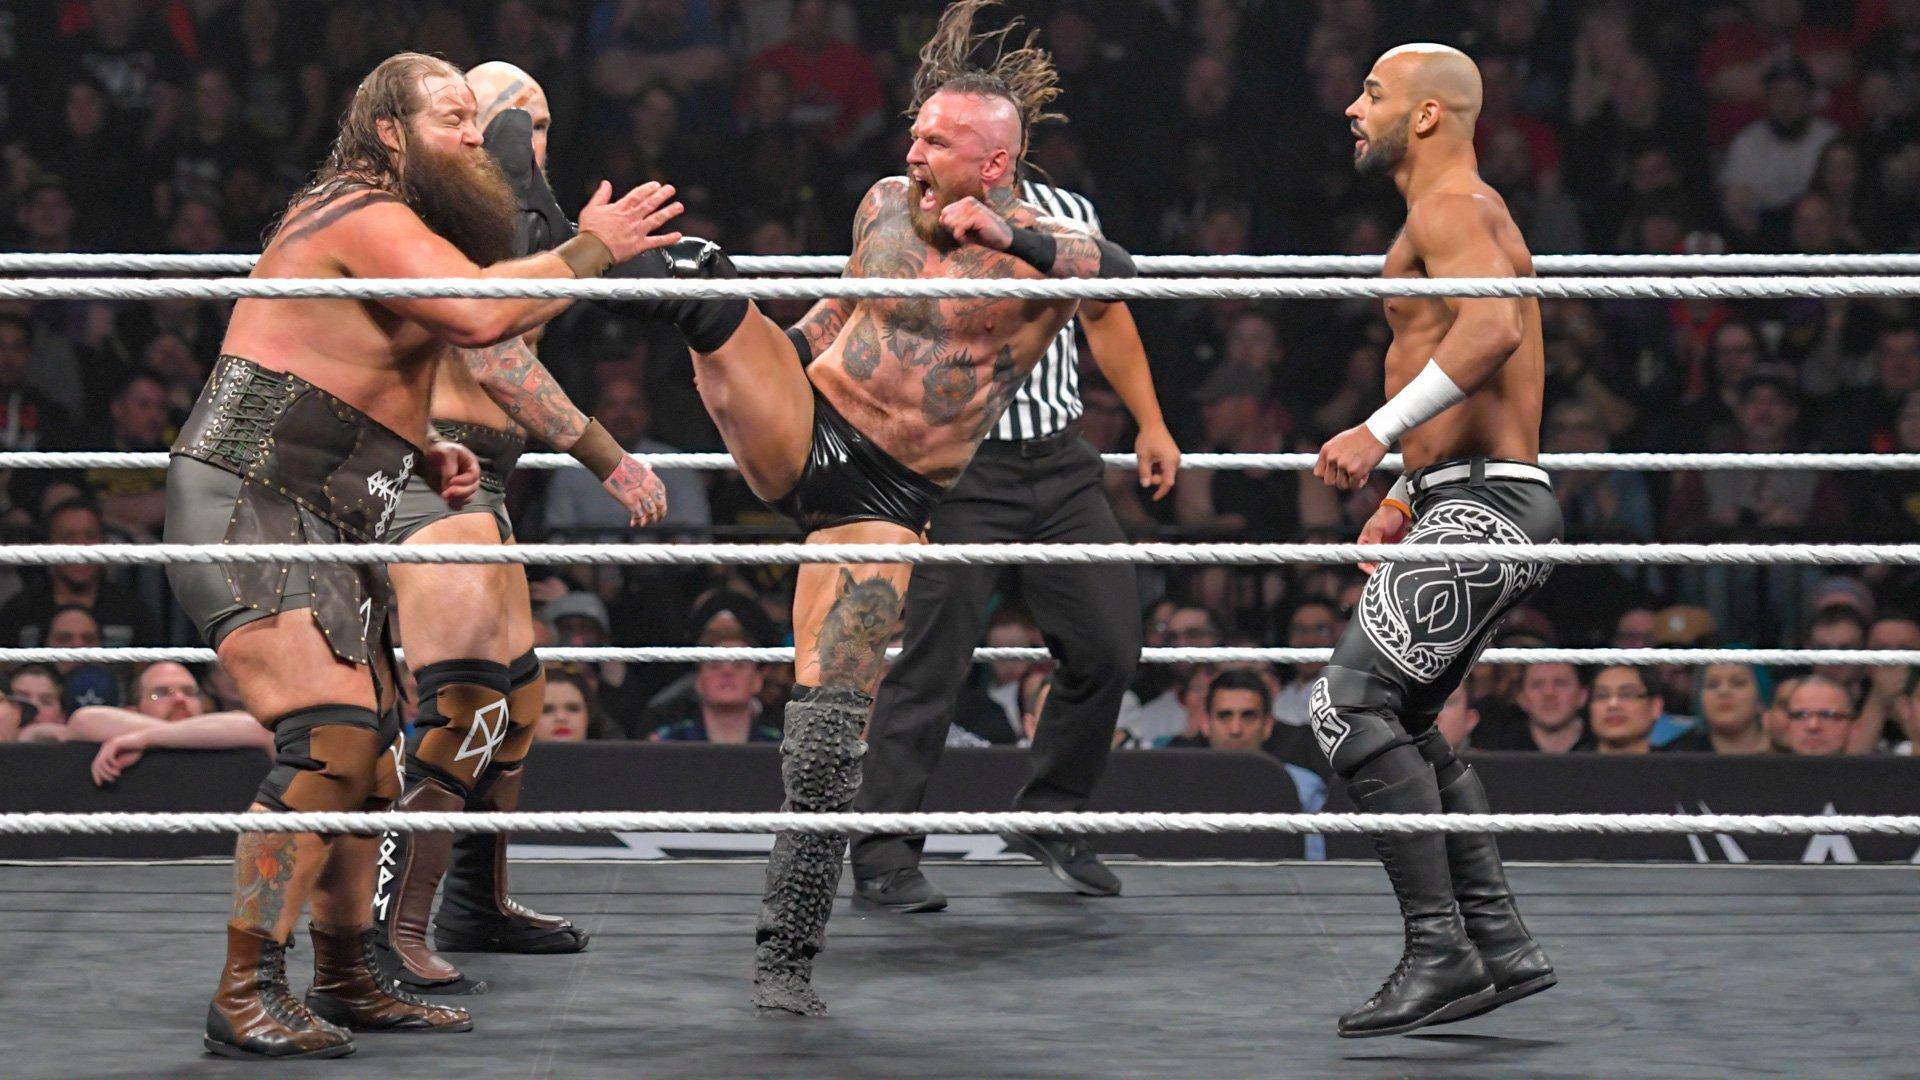 War Raiders vs. Aleister Black & Ricochet - NXT Tag Team Championship Match: photos